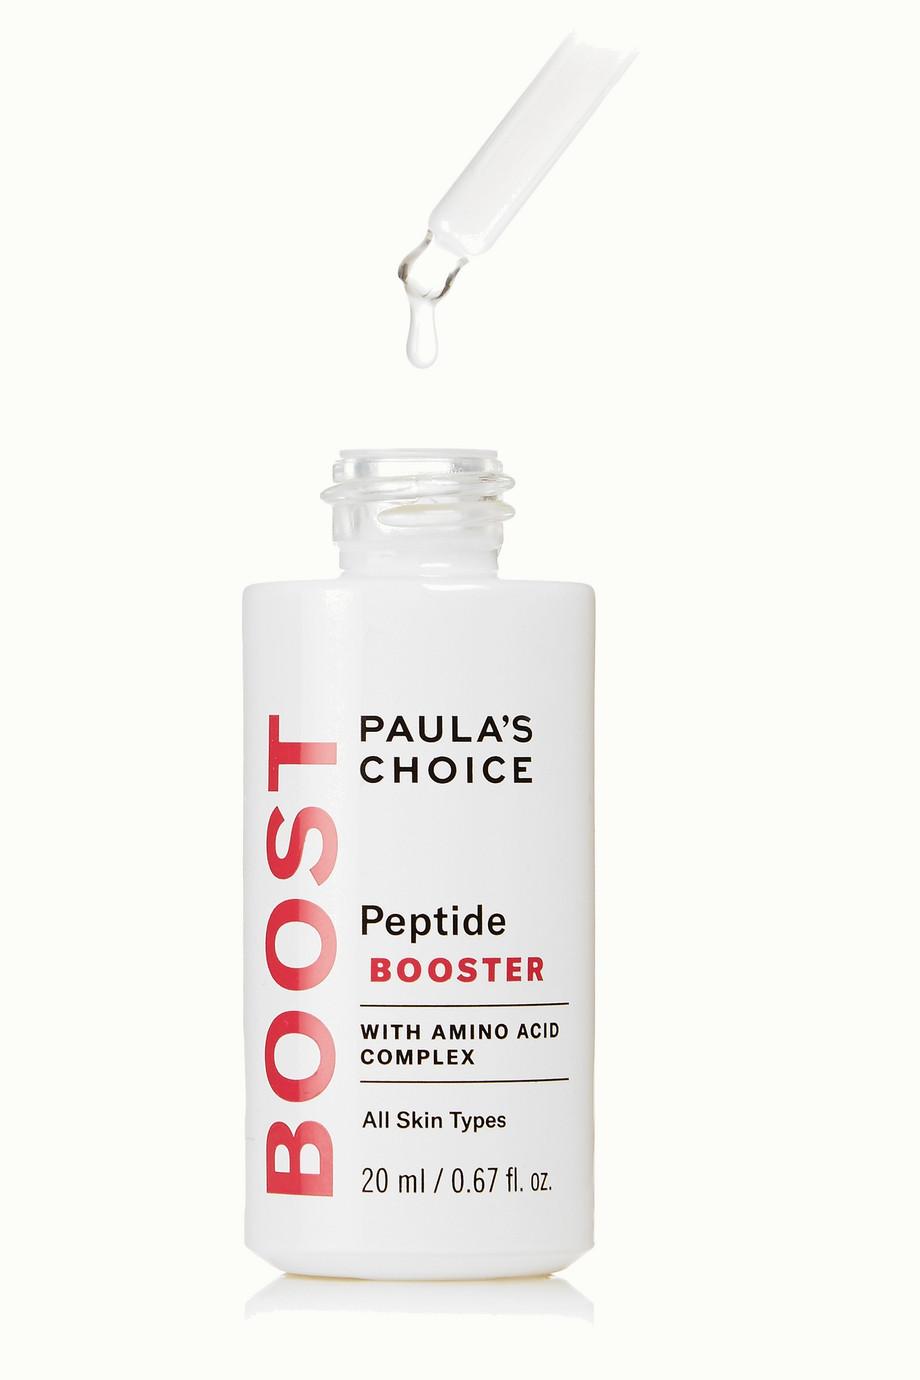 Paula's Choice Peptide Booster, 20 ml – Serum